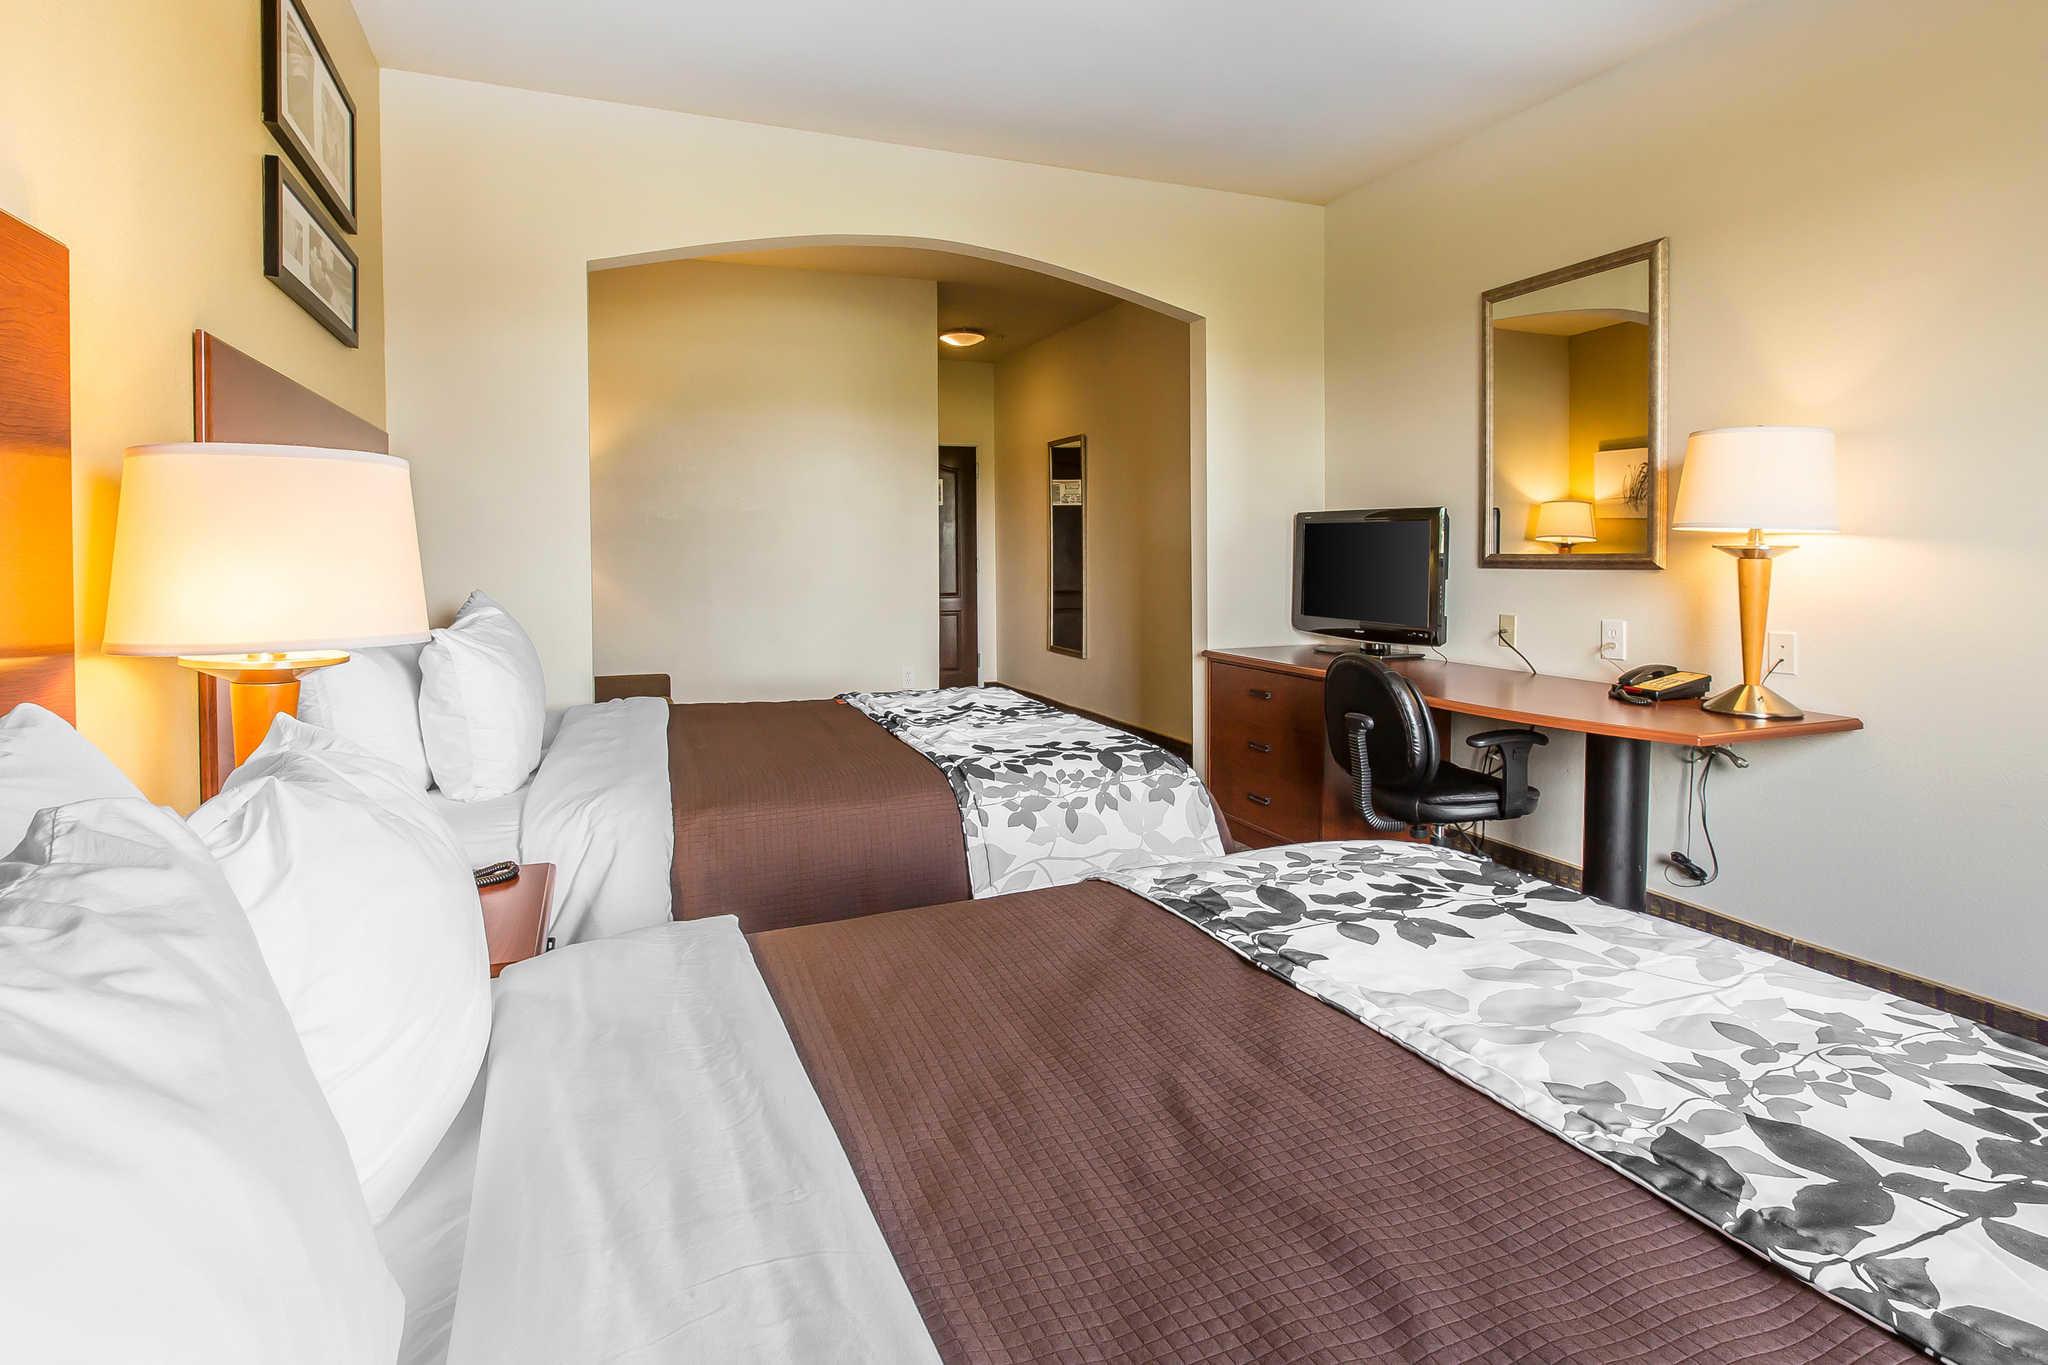 Sleep Inn & Suites At Kennesaw State University image 22